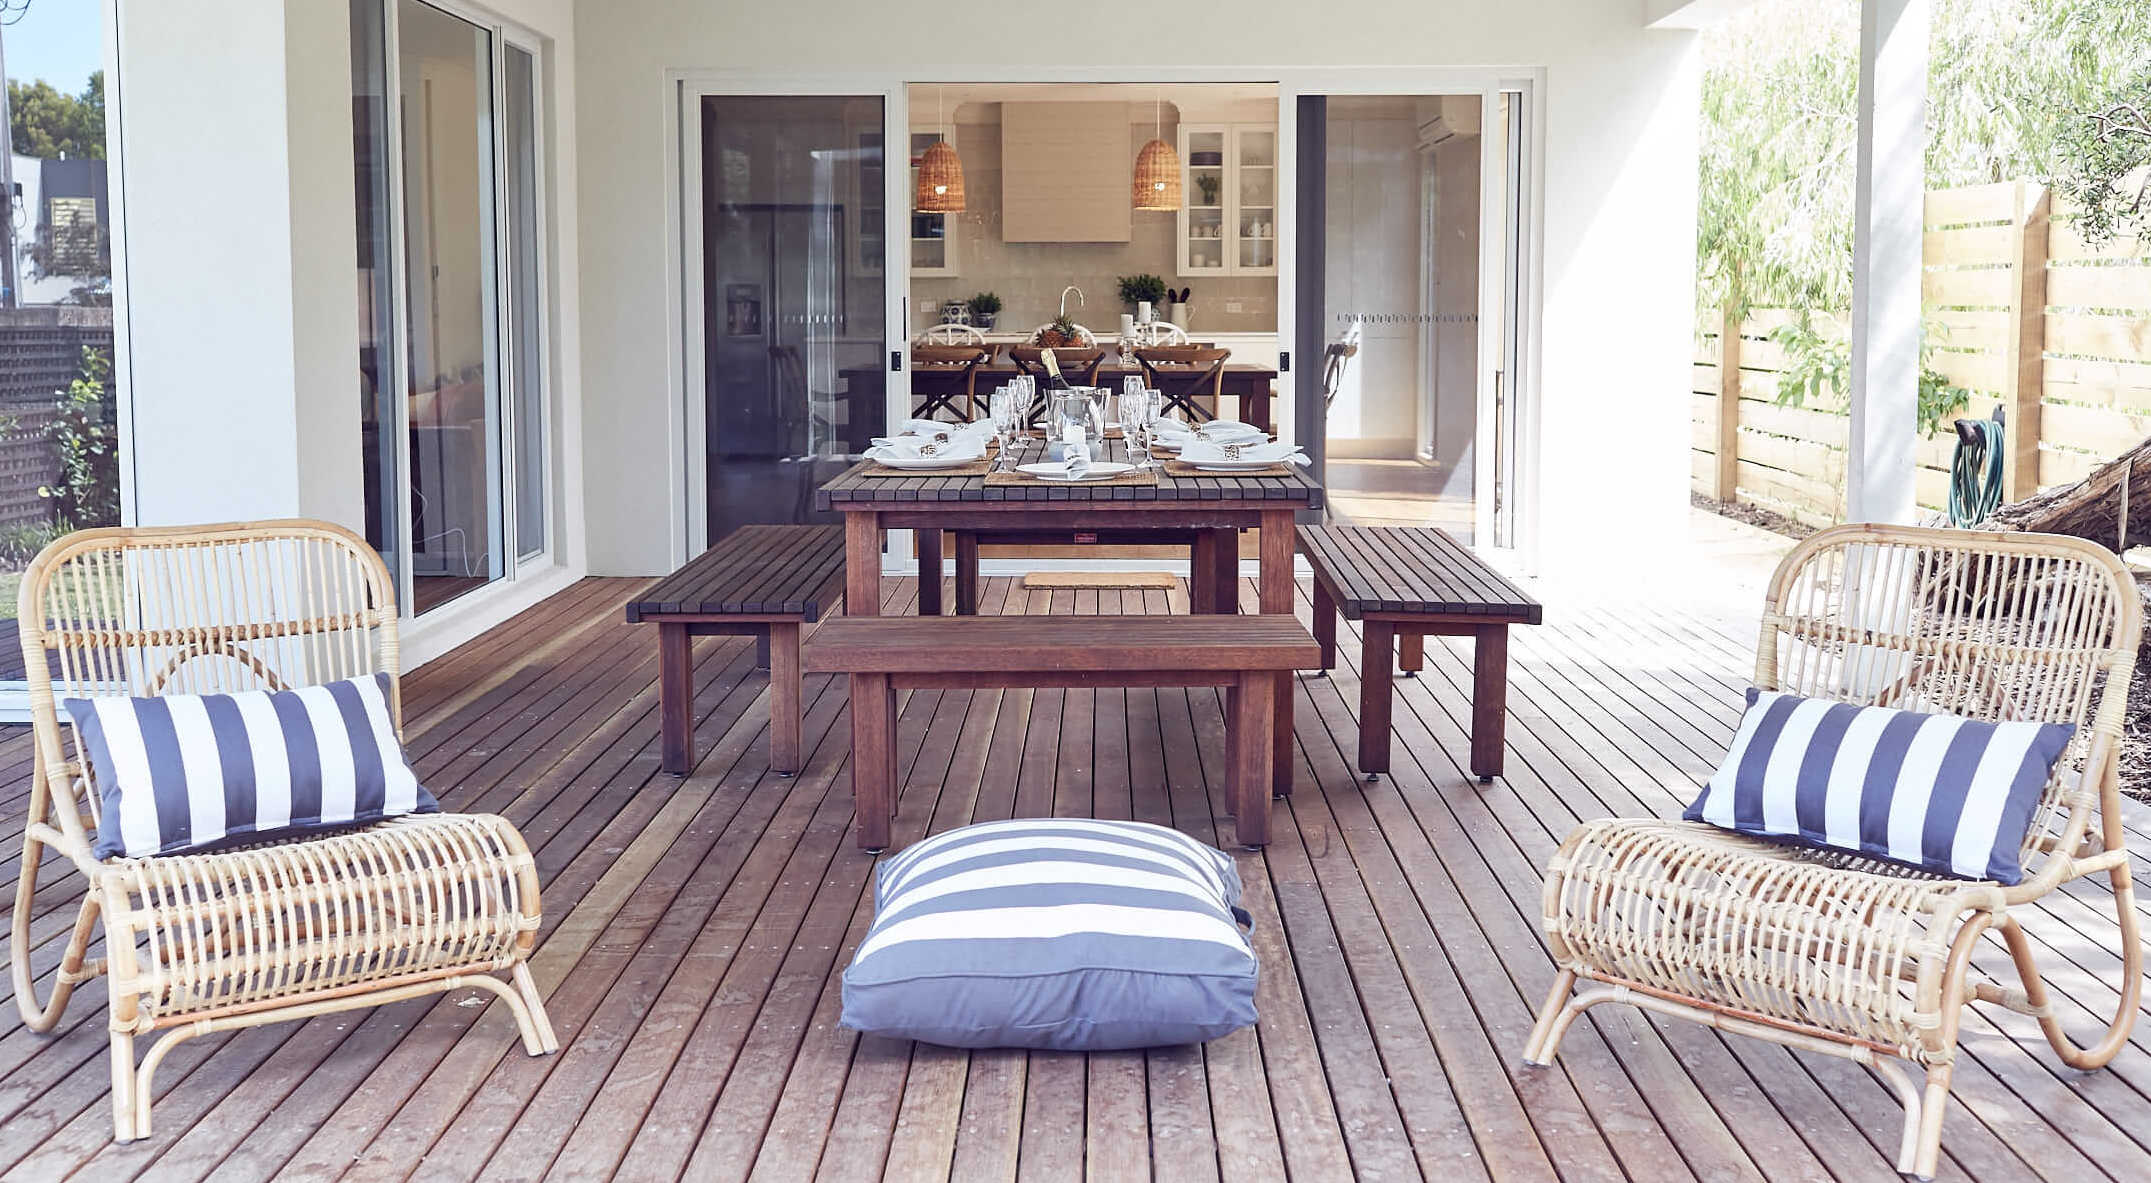 Luxury-accommodation-phillip-island-VERANDAH-RETREAT-alfresco-dining-square.jpg